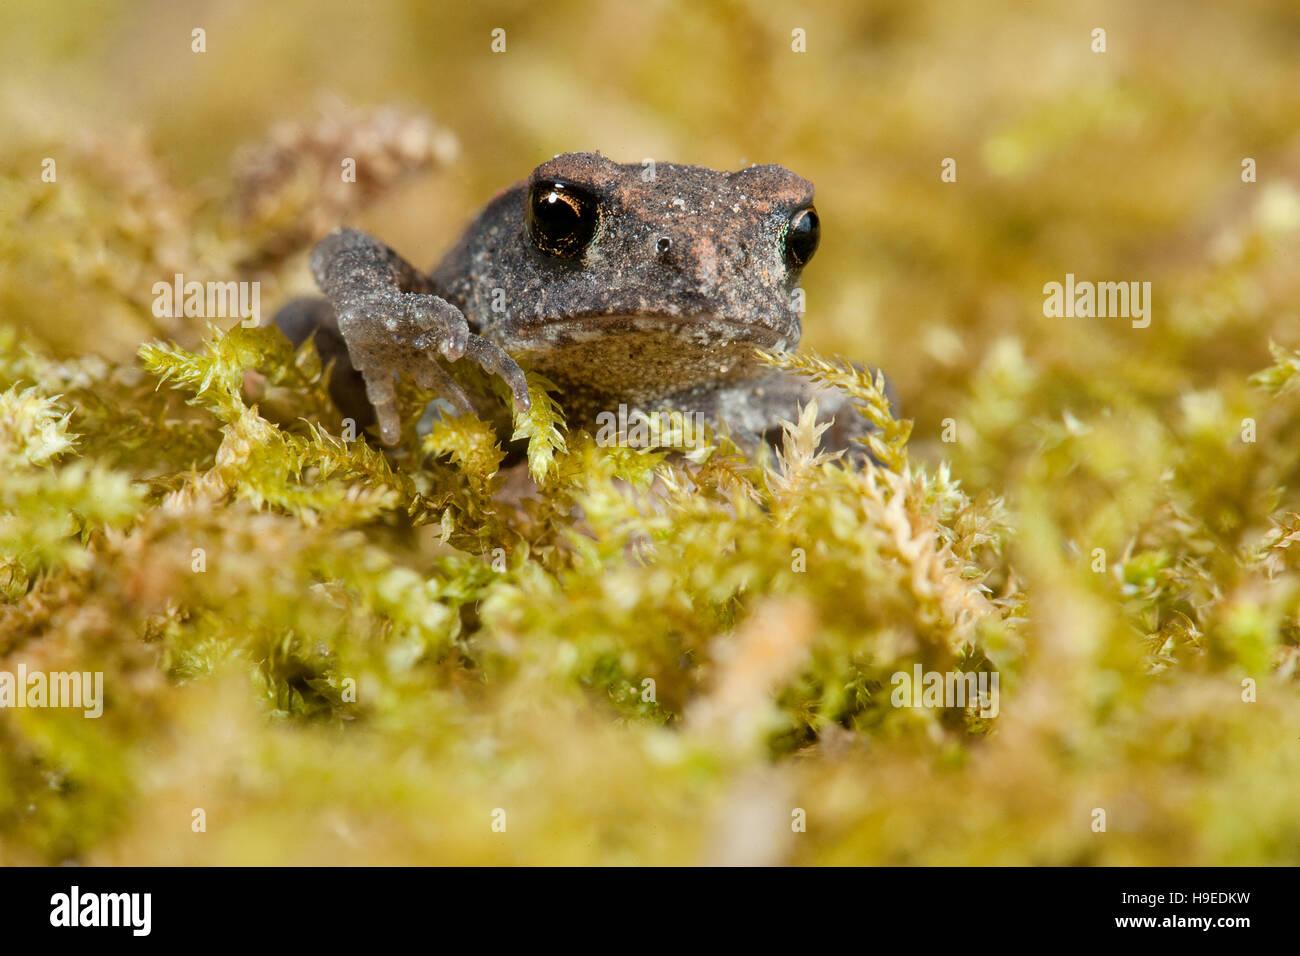 Frog - Stock Image